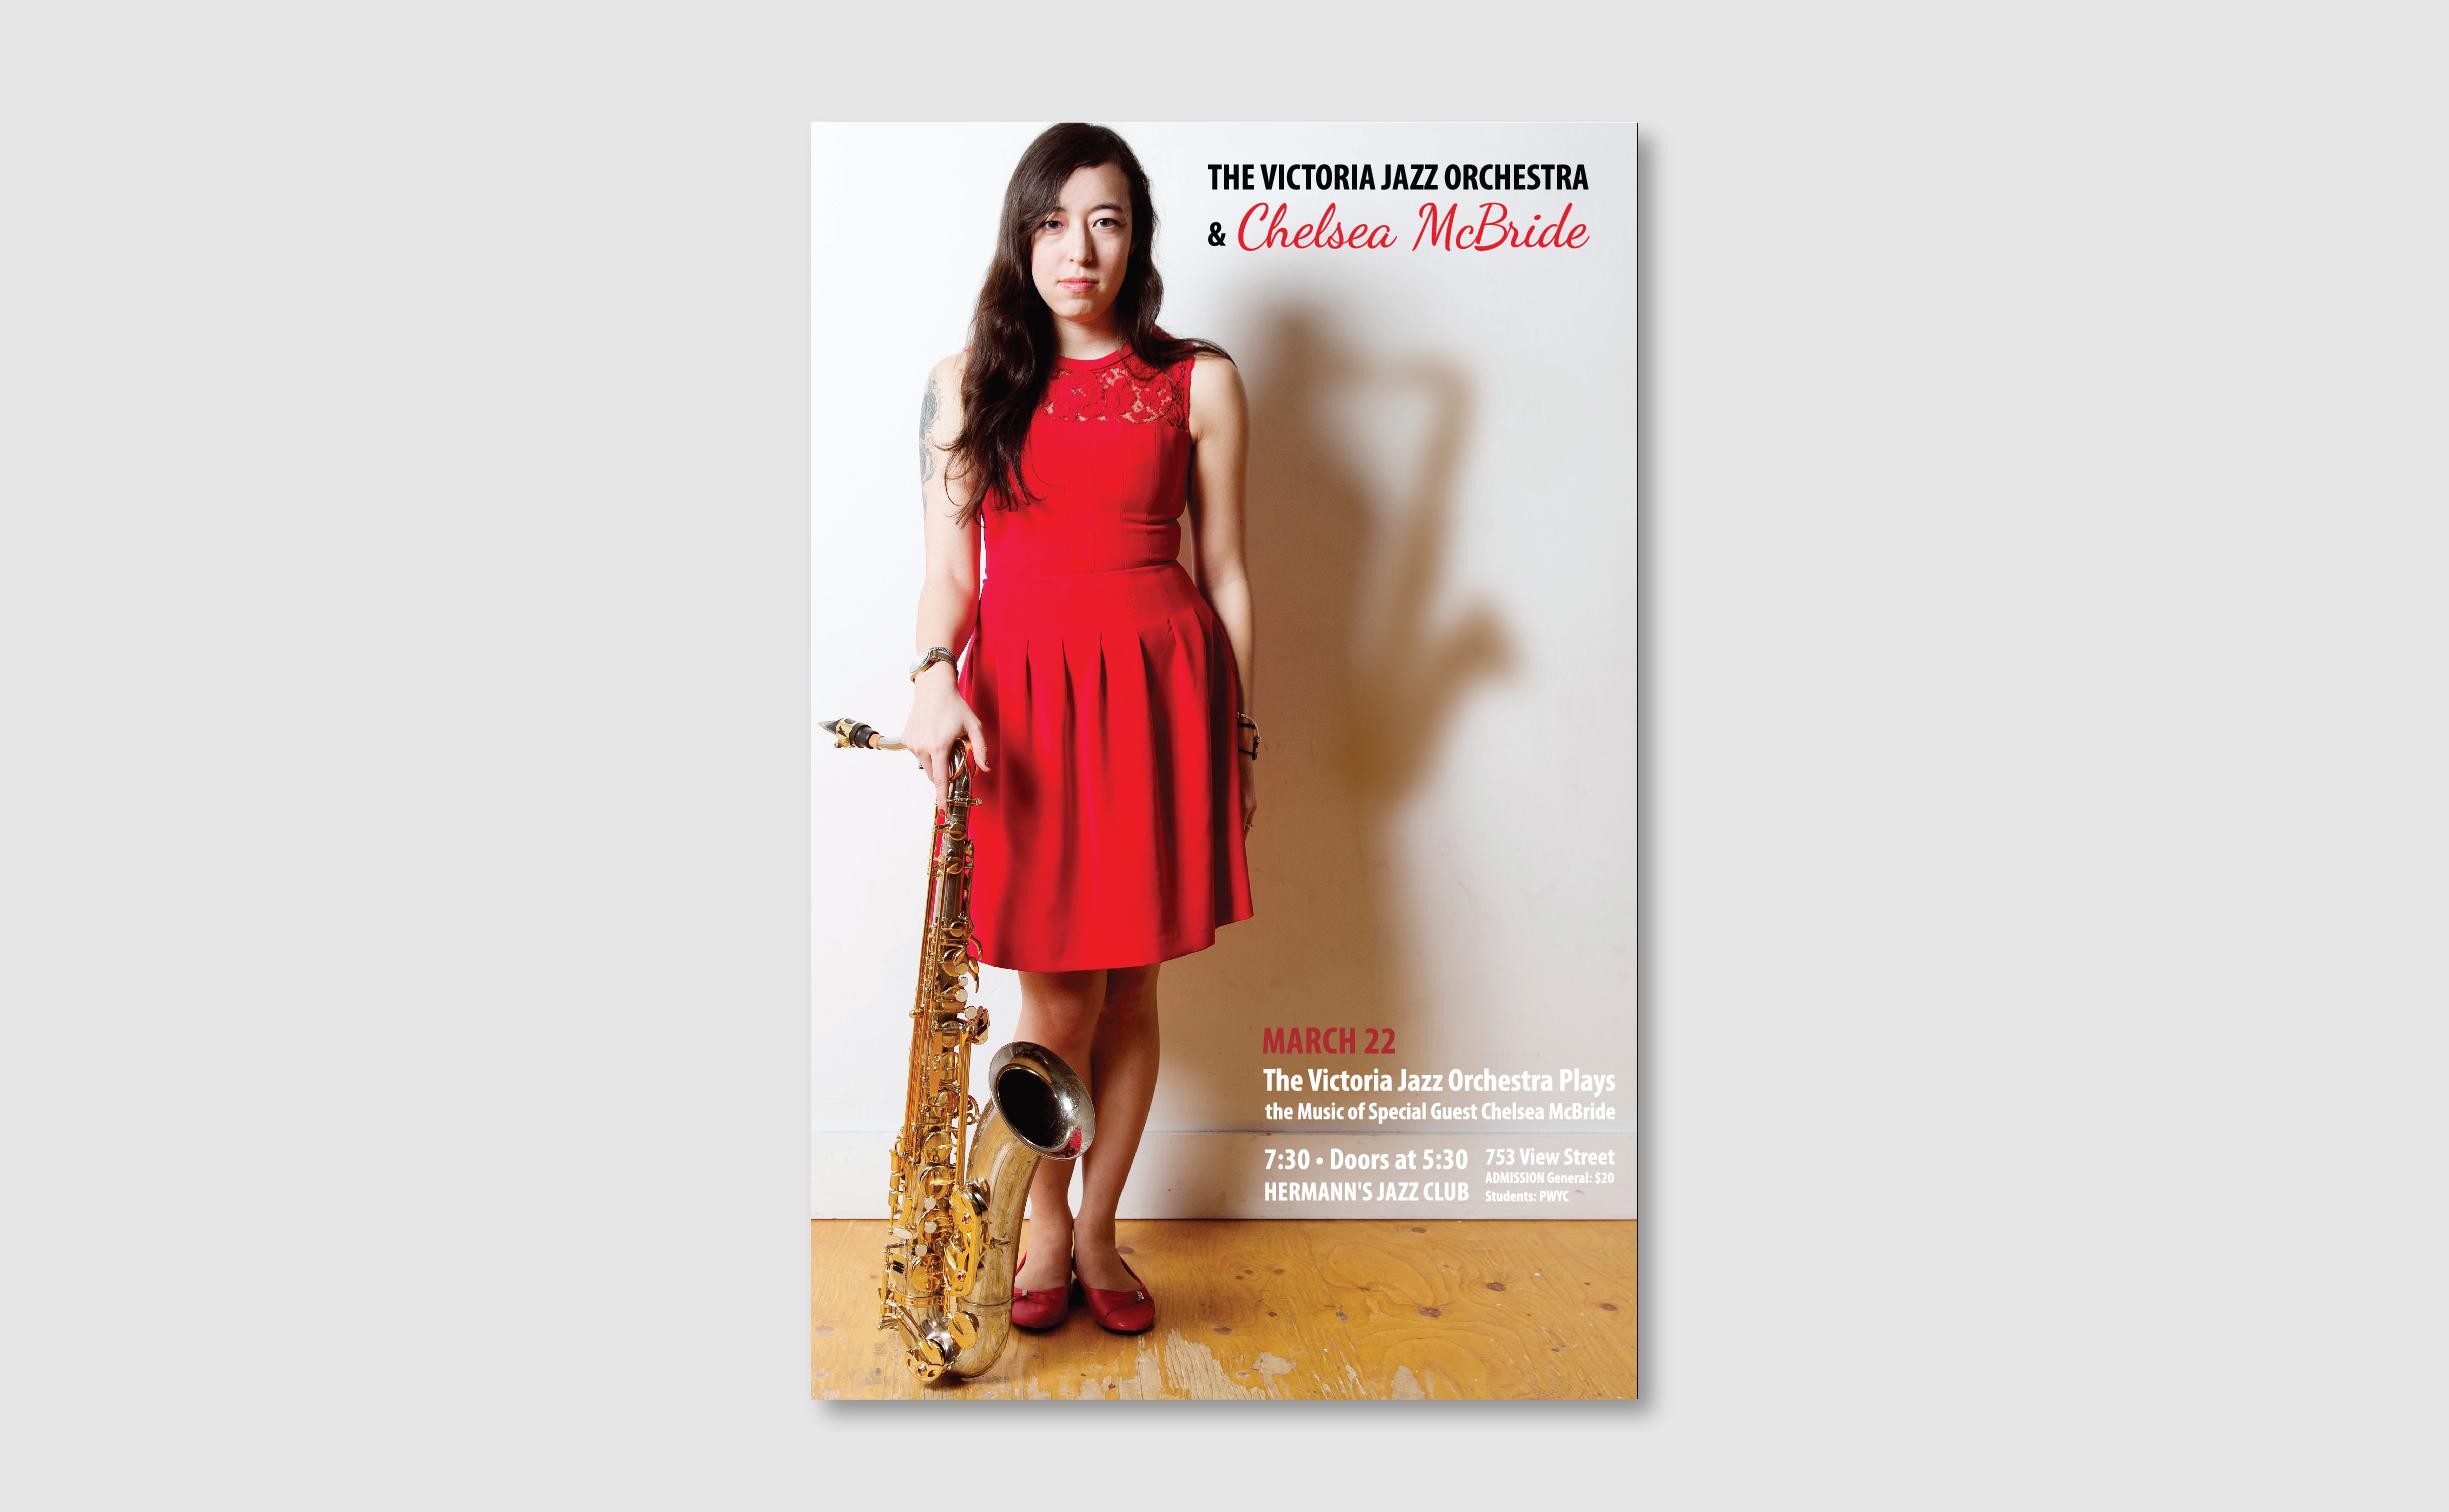 Simeon-Goa_Victoria-Canada_Graphic-Design_Illustration-victoria-jazz-orchestra_Chelsey-McBride.jpg